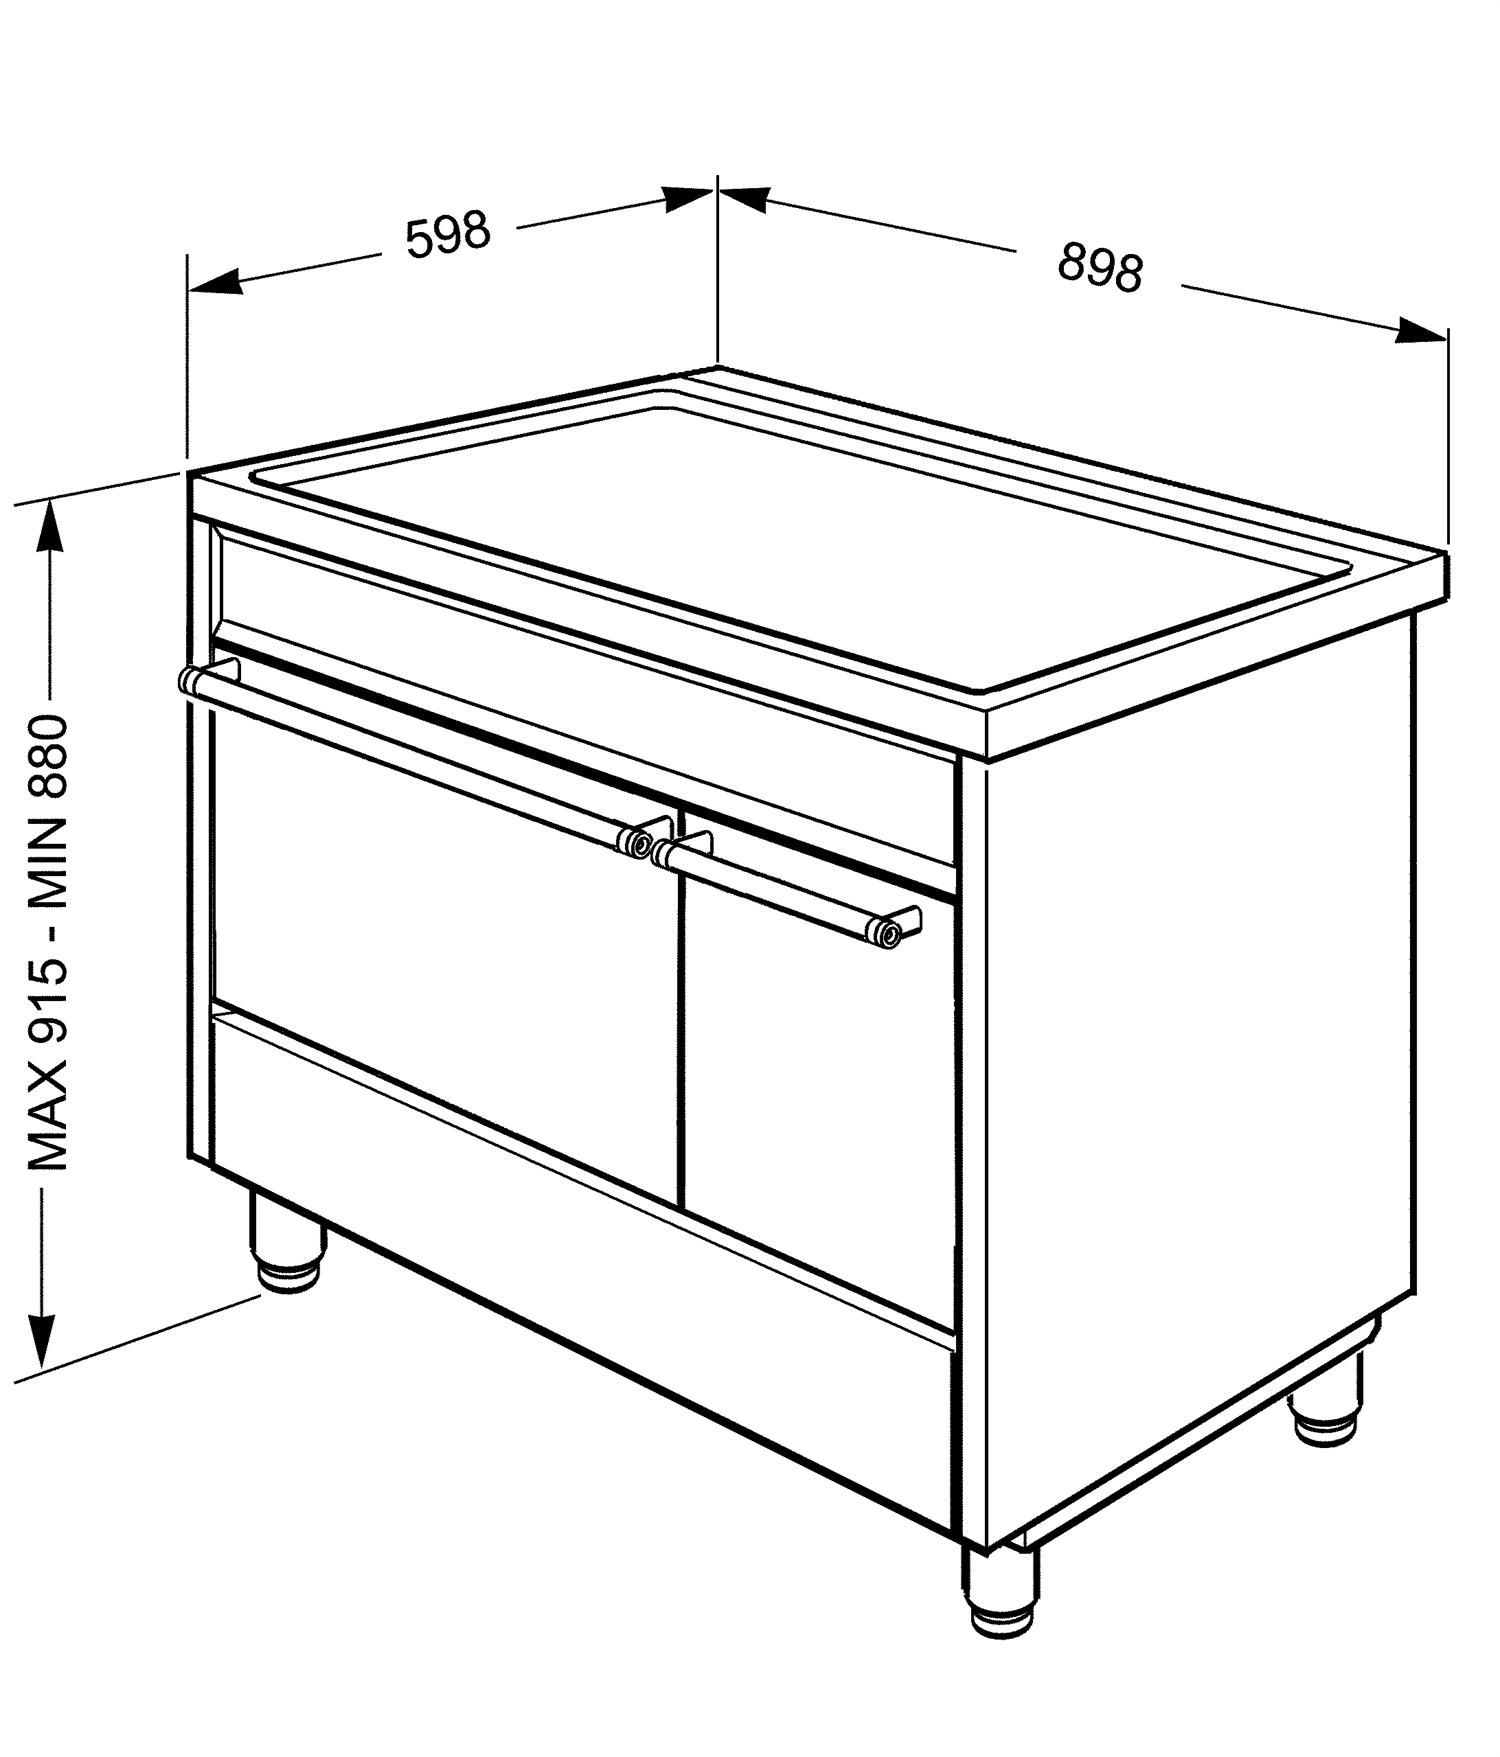 Maattekening SMEG fornuis inductie rvs C92IPX9